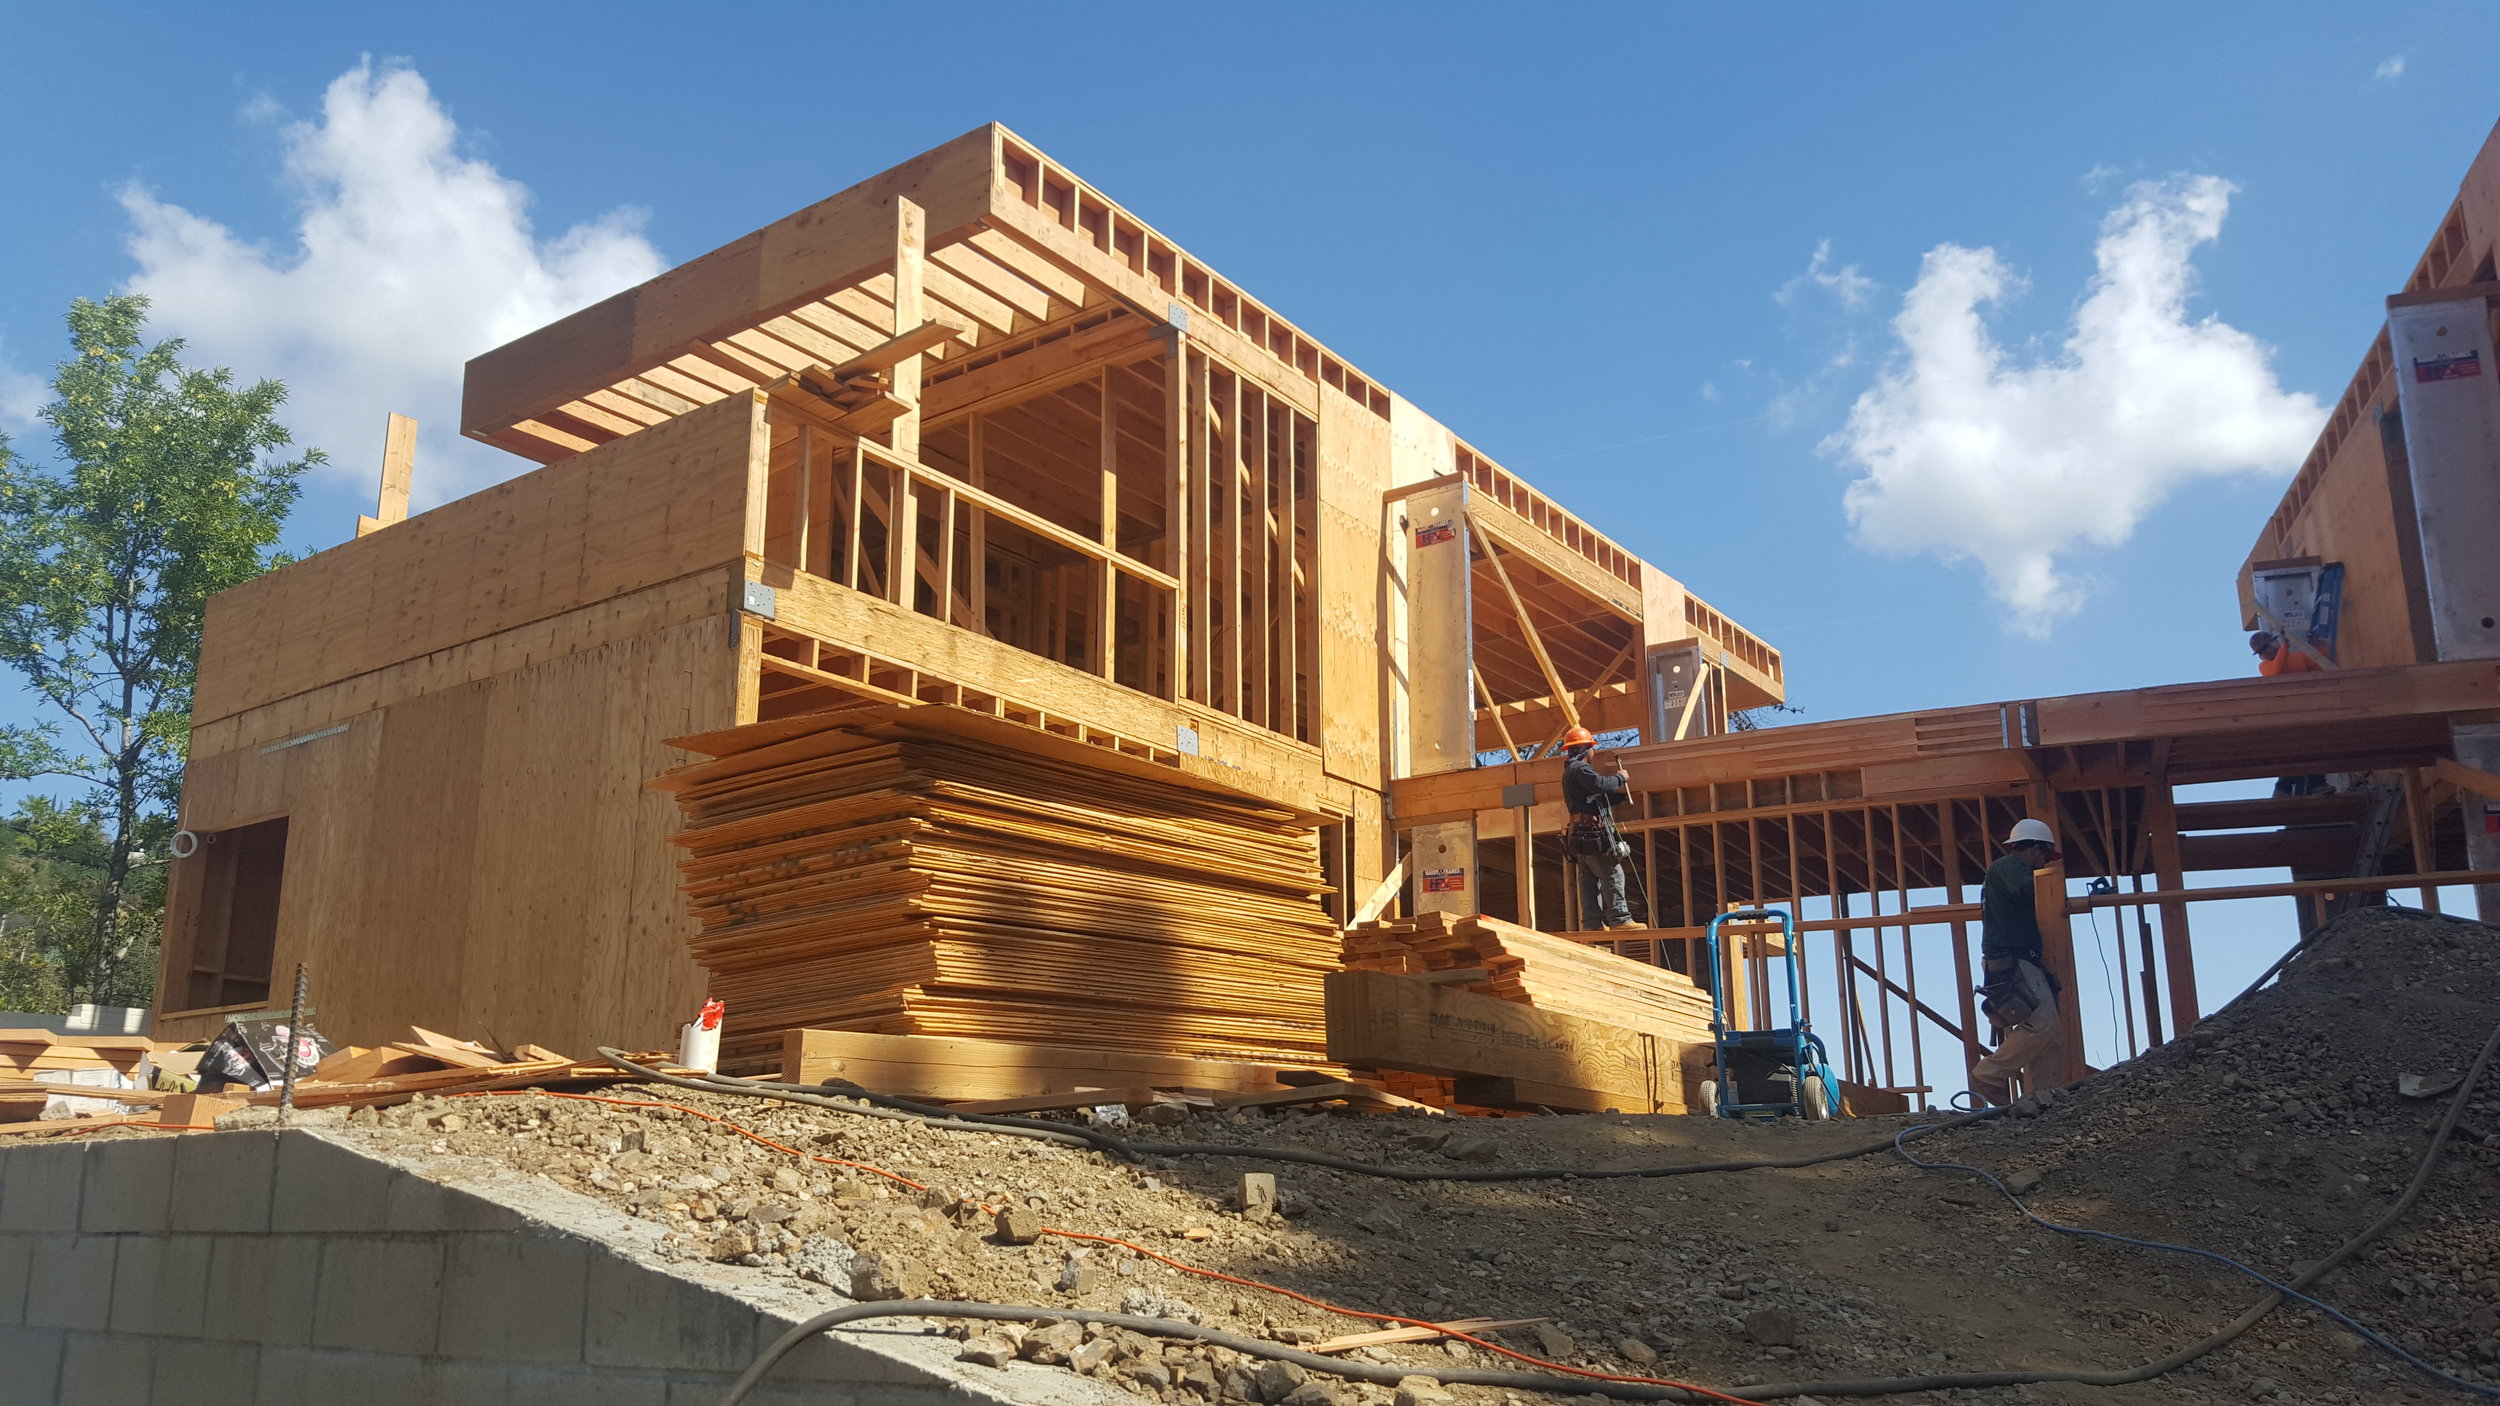 6,000 Sq Ft 3 level custom home. Built in 2 separate wings with bridge.